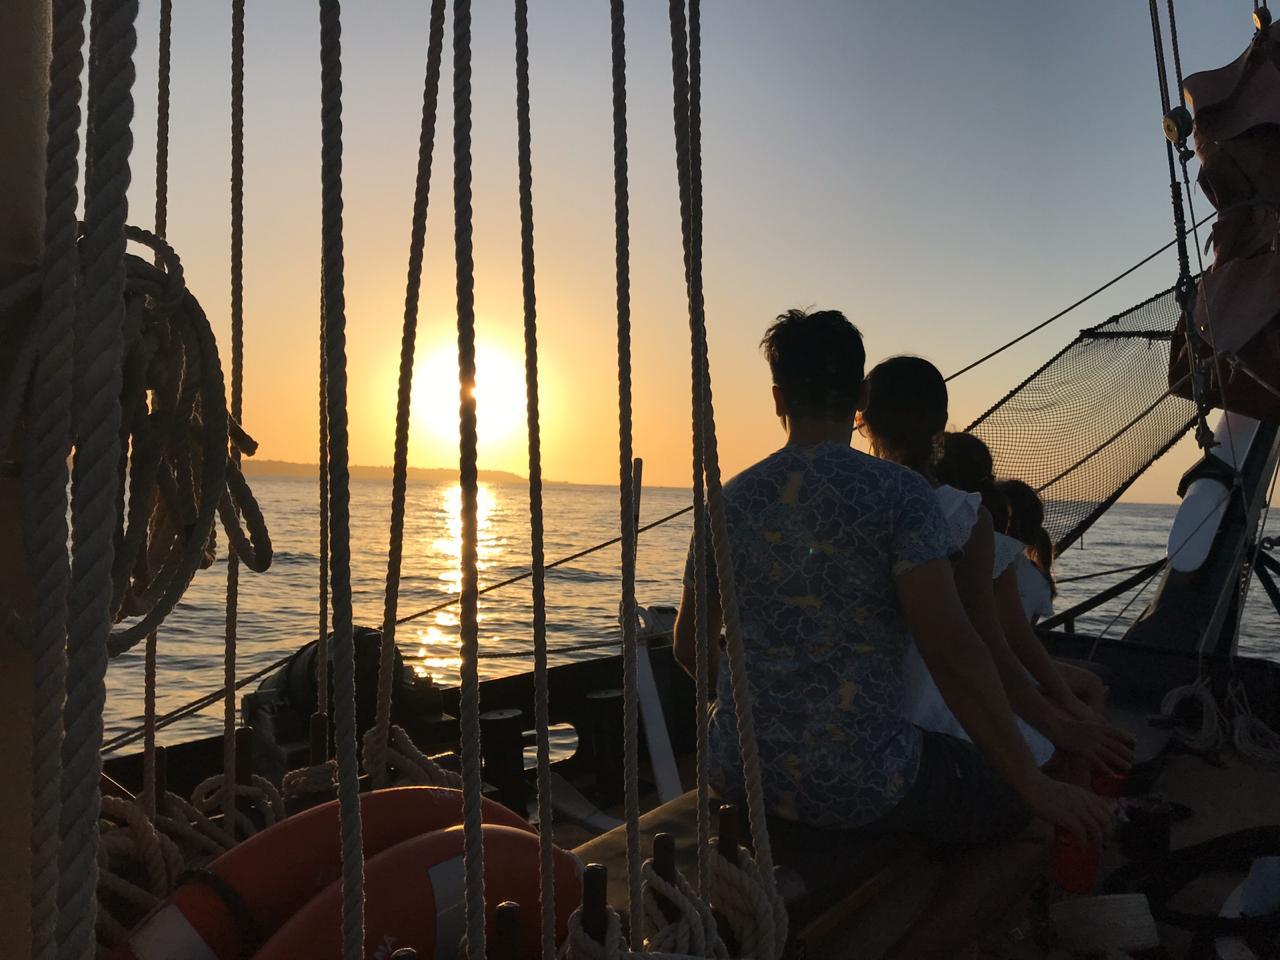 Sunset Boat Tour Cartagena Pirate Ship La Fantastica Family